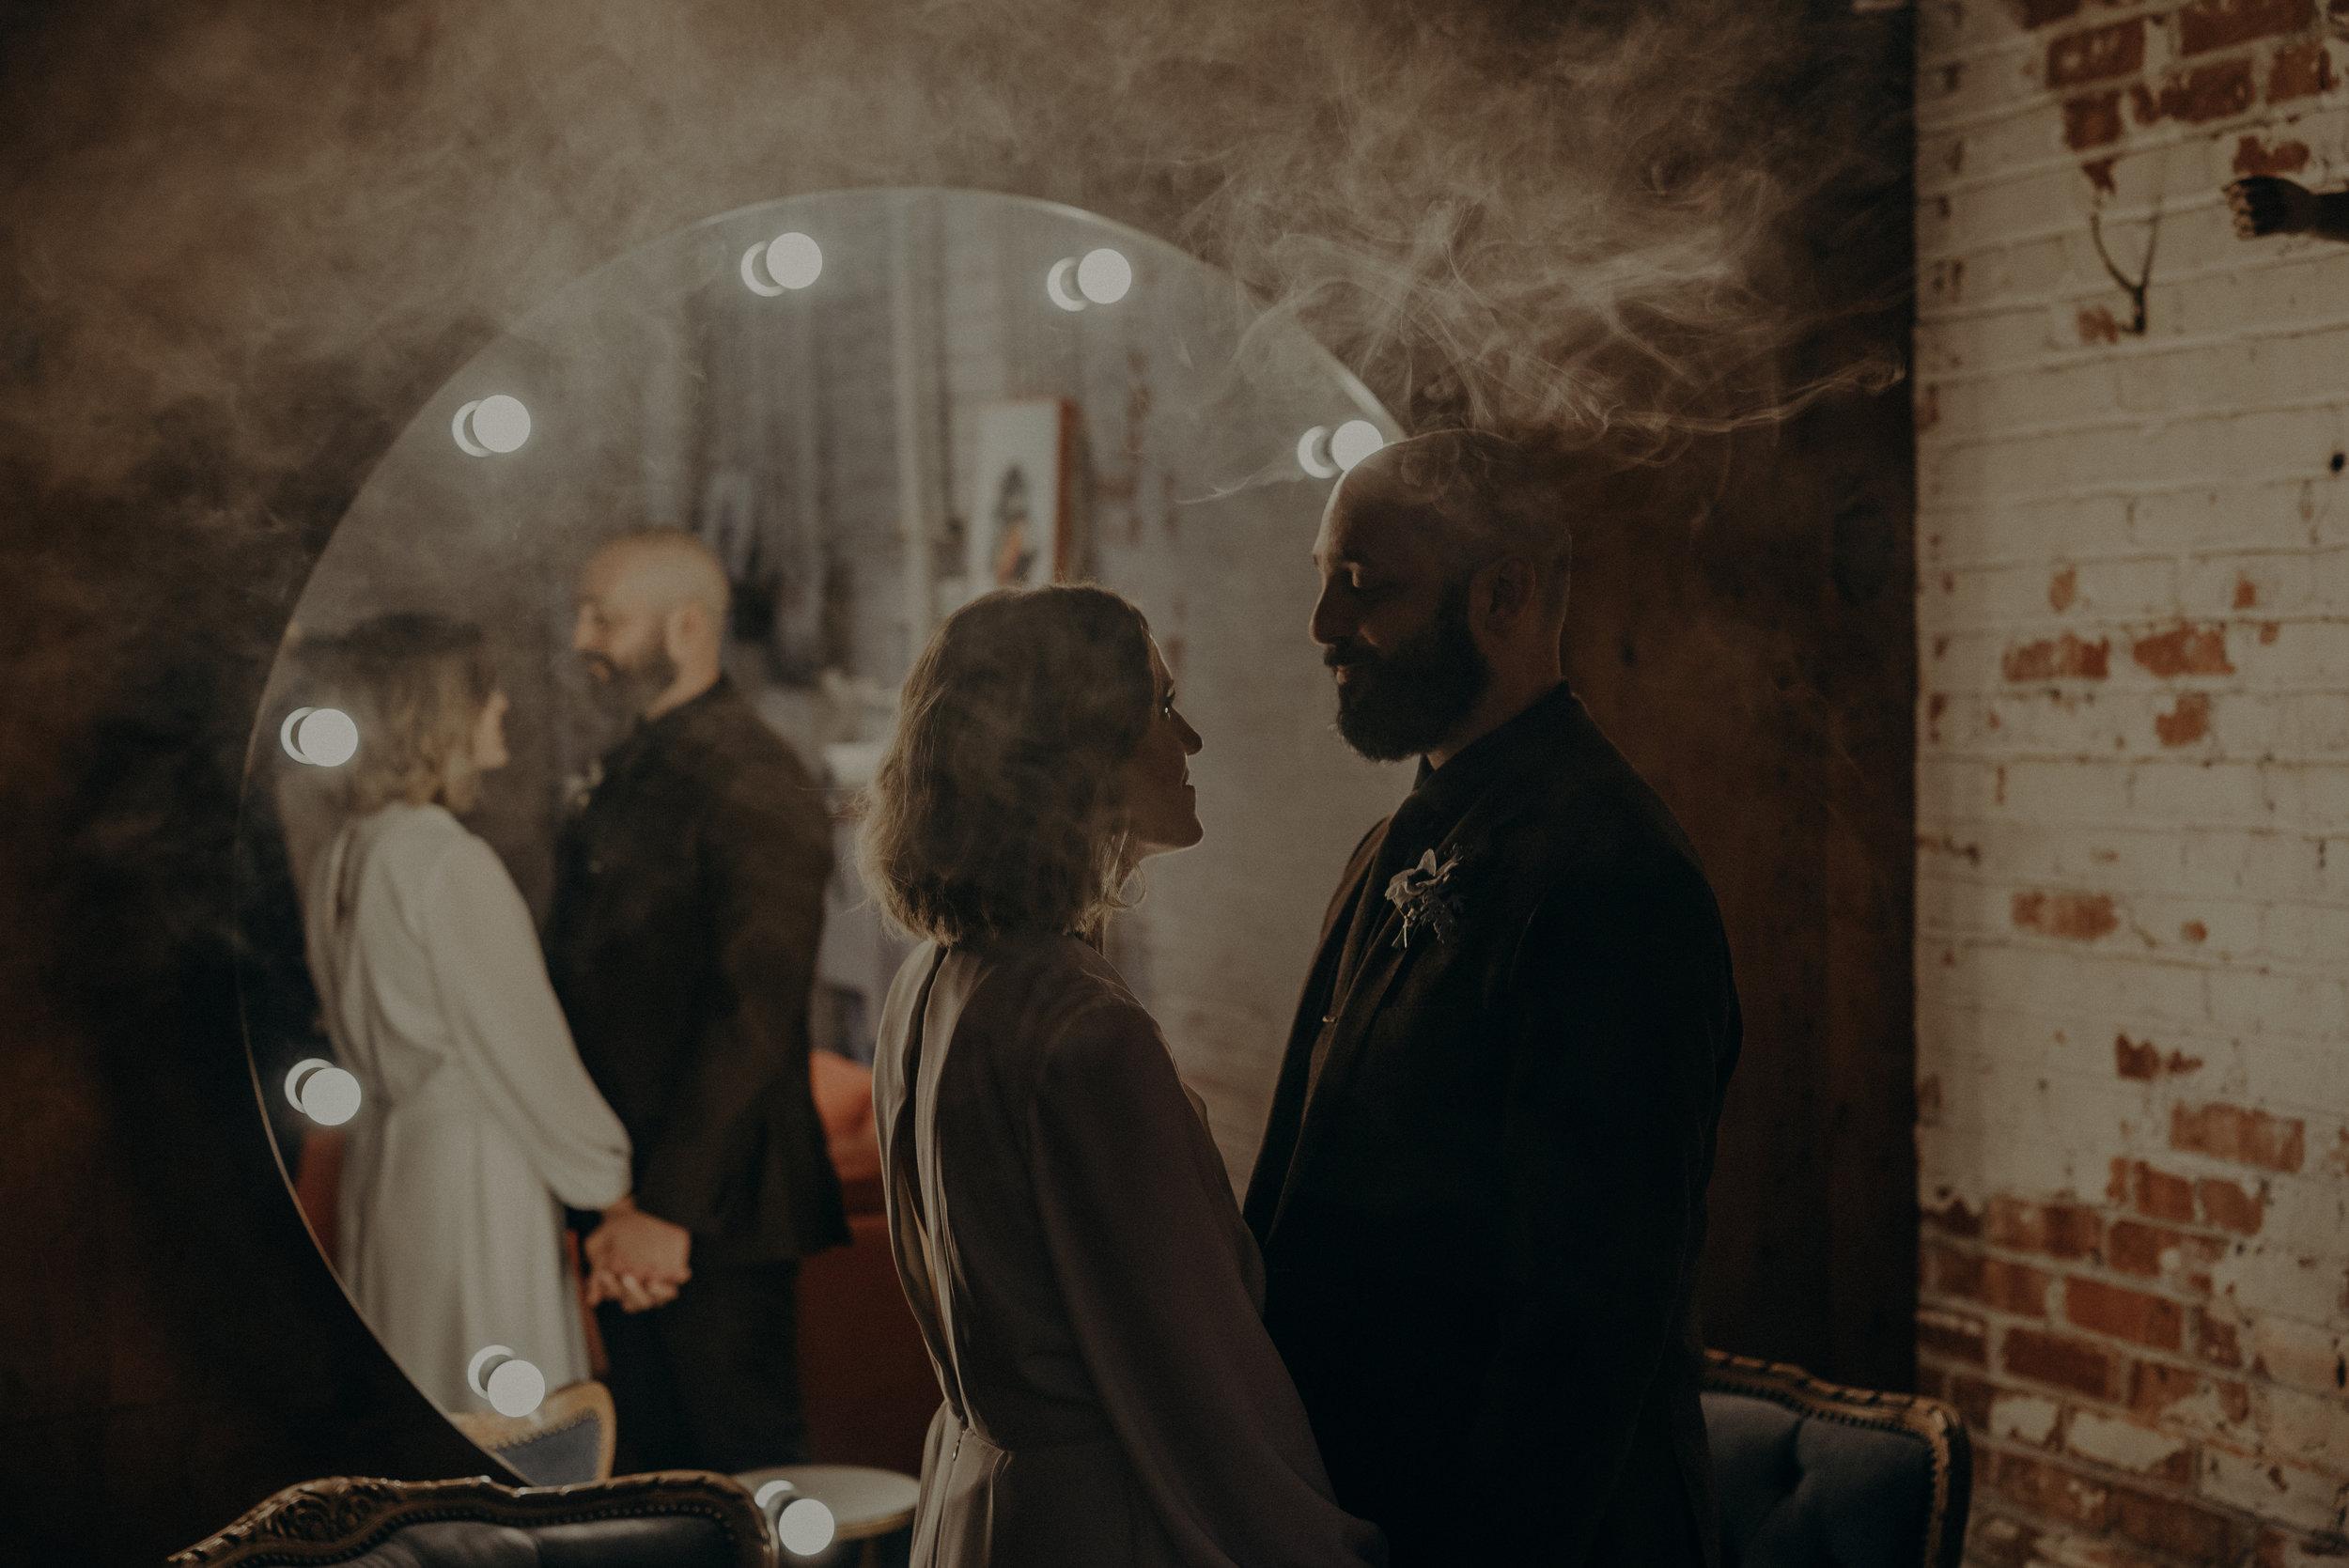 Isaiah + Taylor Photography - Reese + Jonathan Wedding-153.jpg